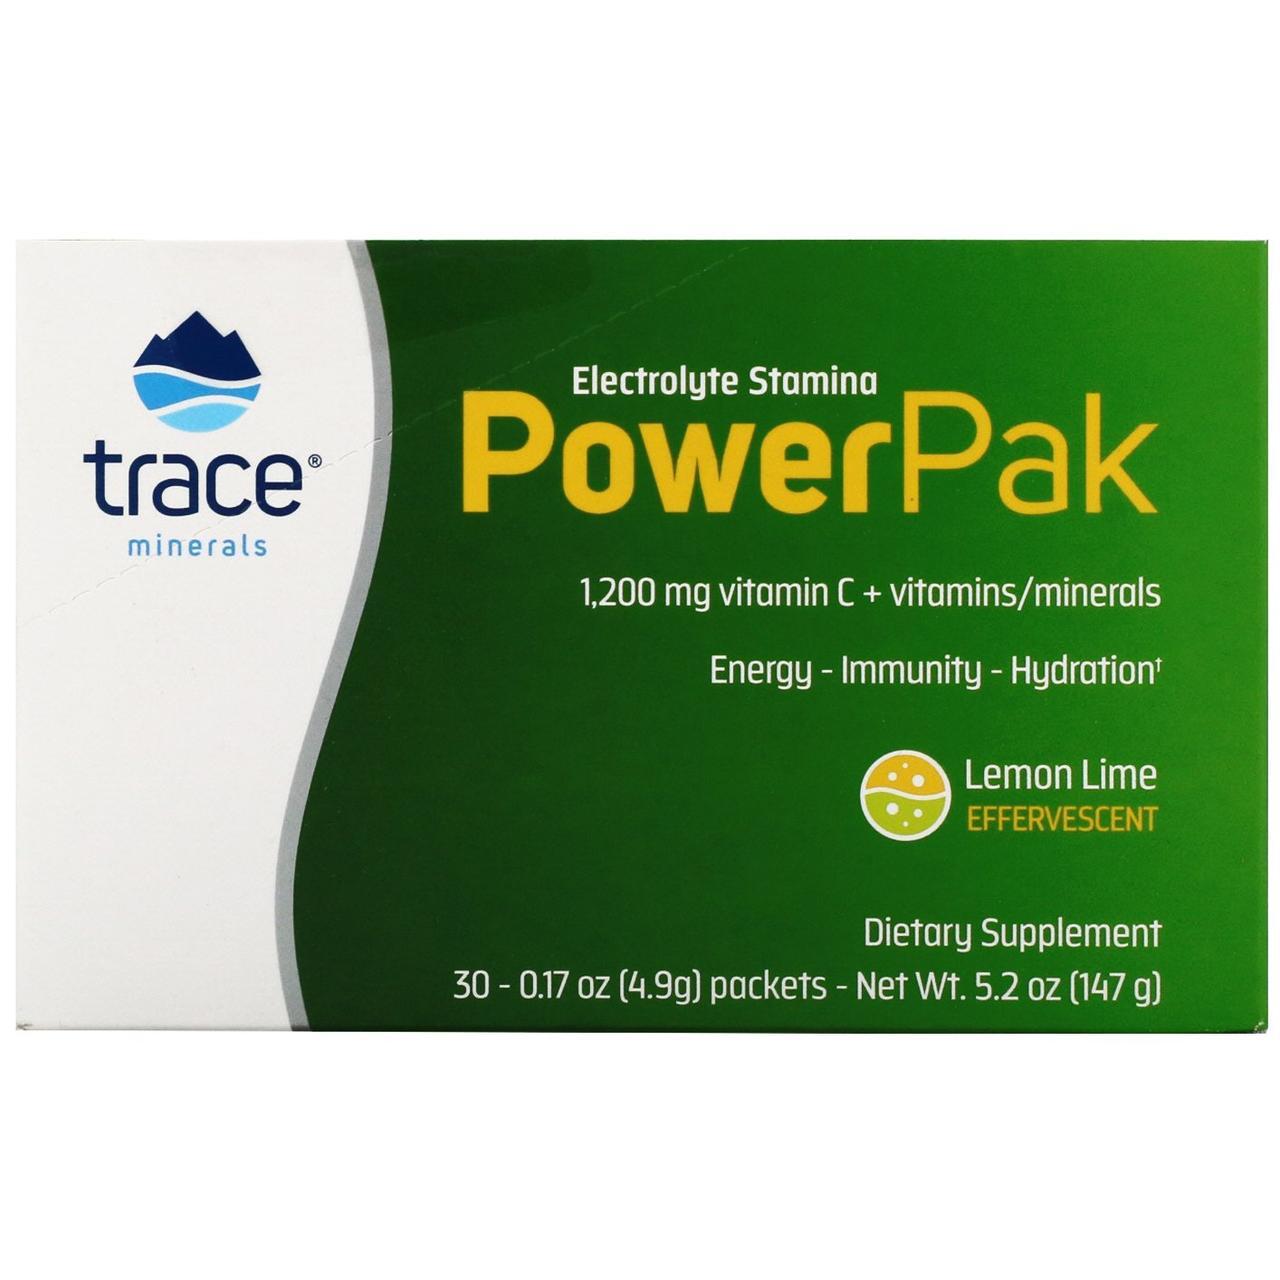 Электролитическая стойкость и витамин С от Trace Minerals Research, вкус лимон-лайм, 30 пакетиков по 4.9 г